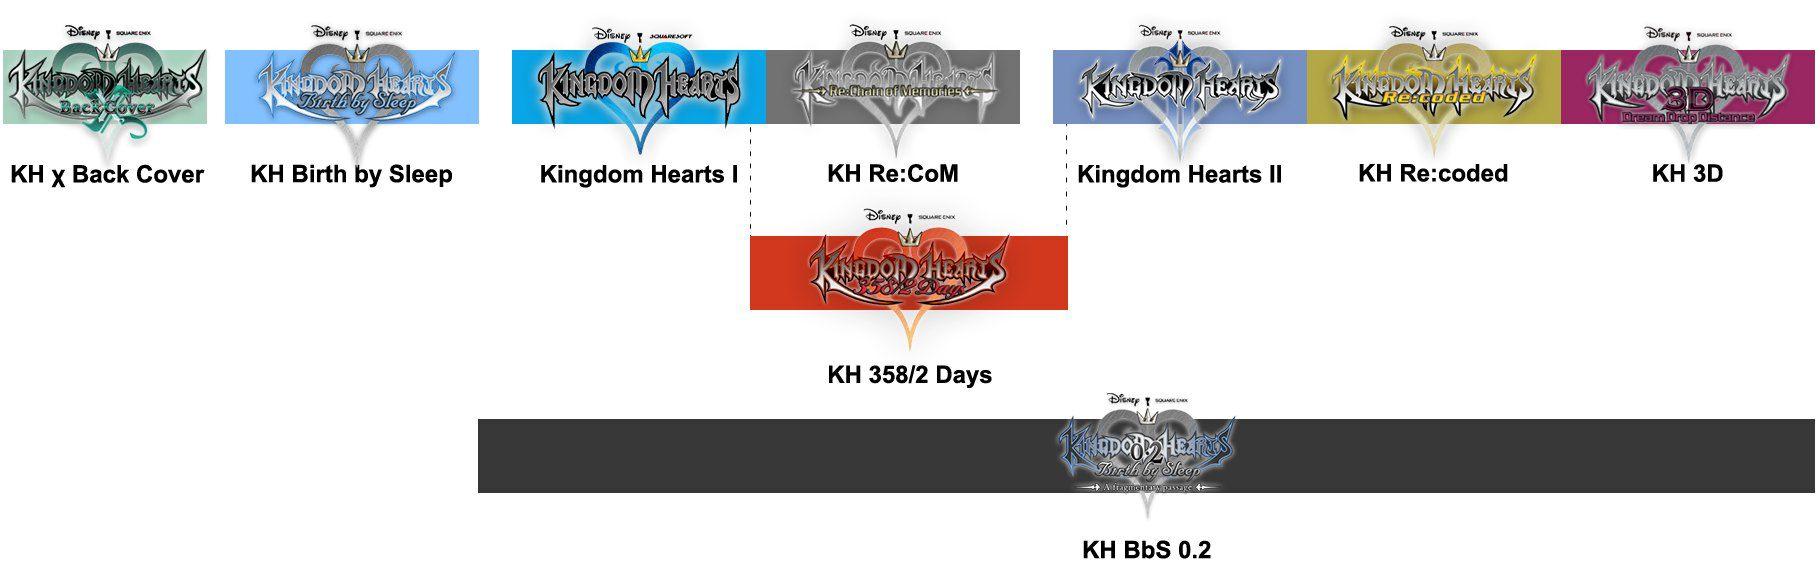 play kingdom hearts online free no download